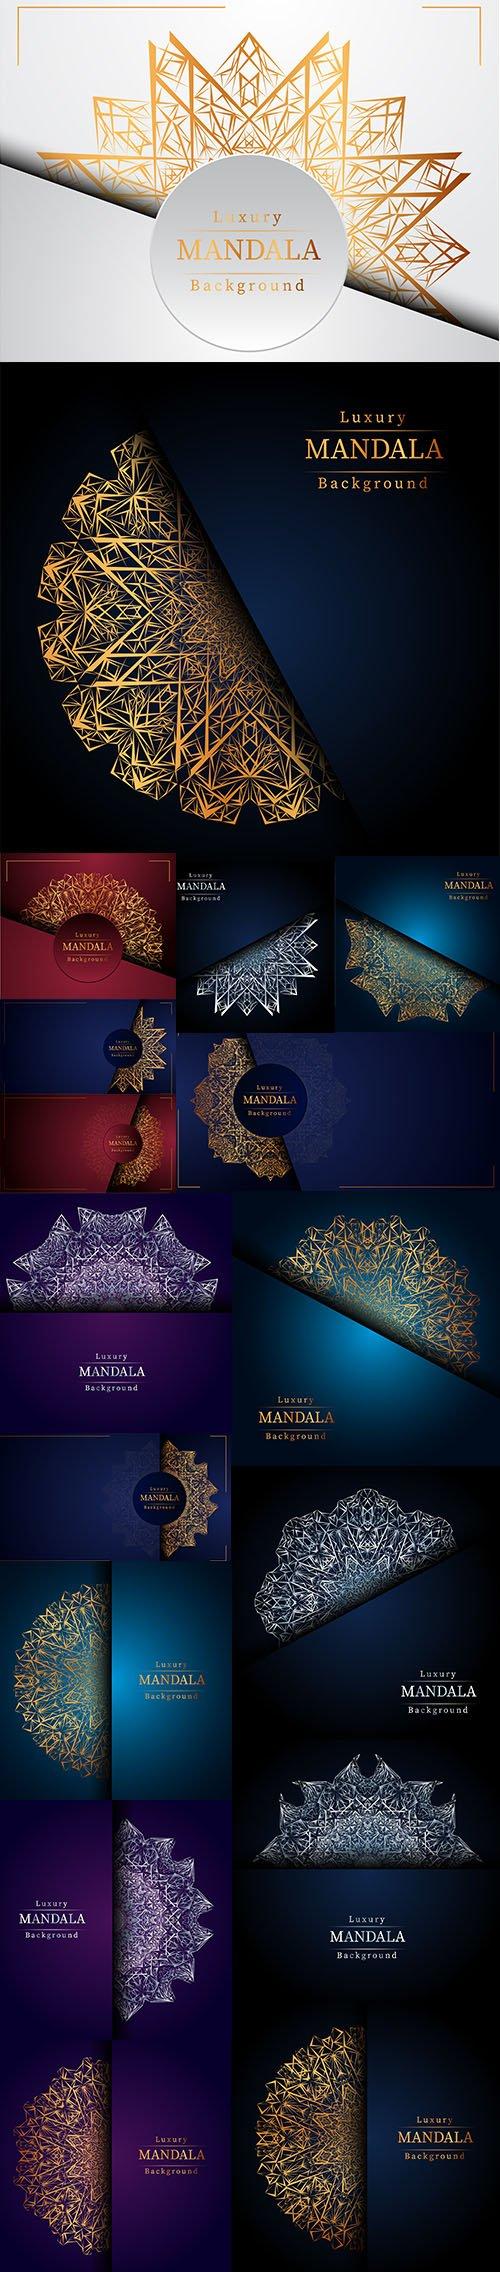 Creative Luxury Mandala Illustrations Premium Set